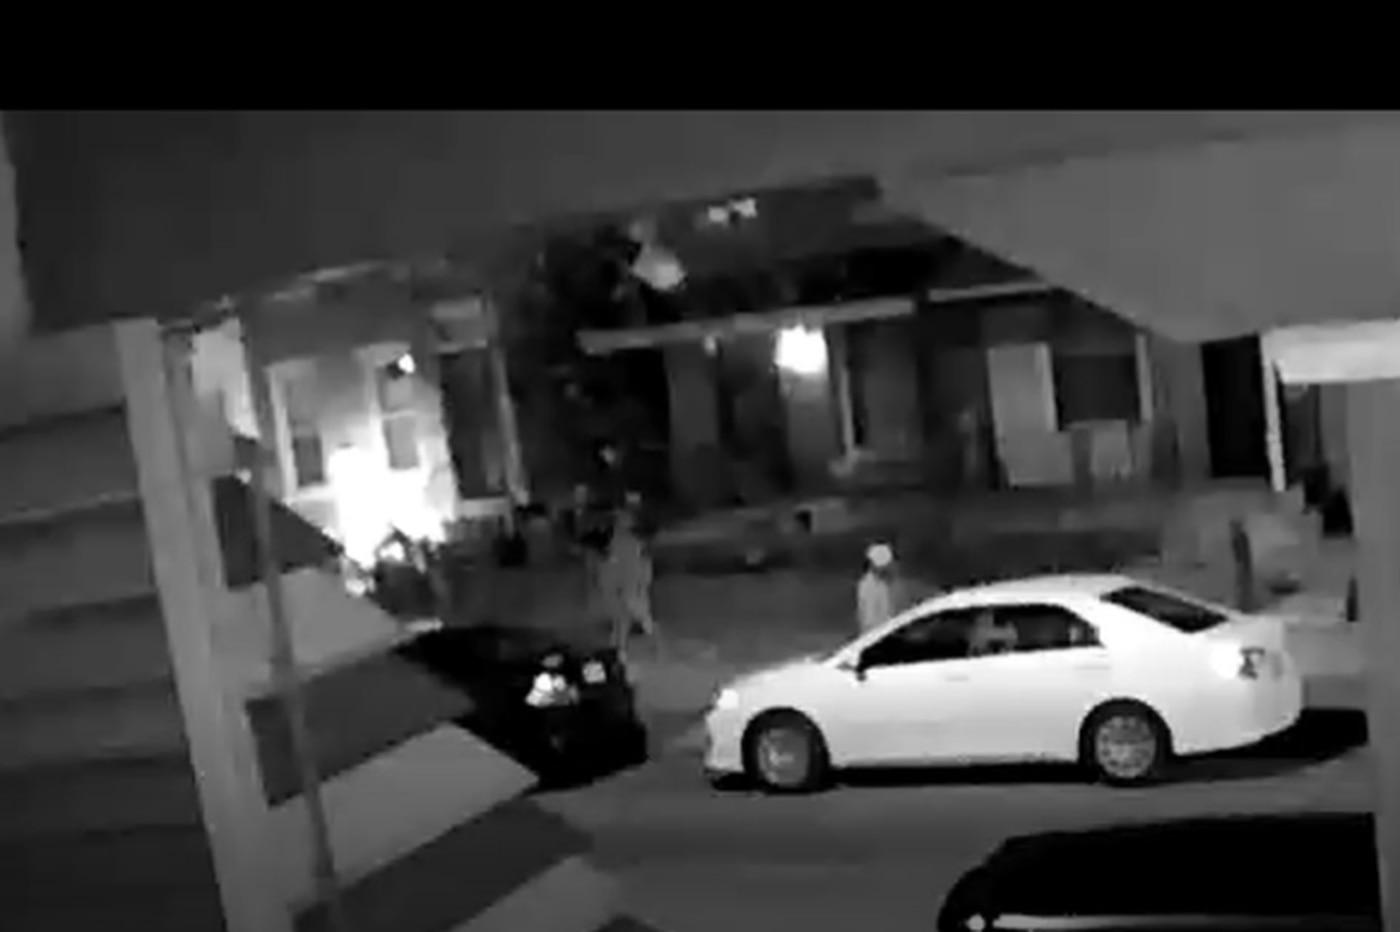 Police seek trio in tire slashing spree in West Philadelphia